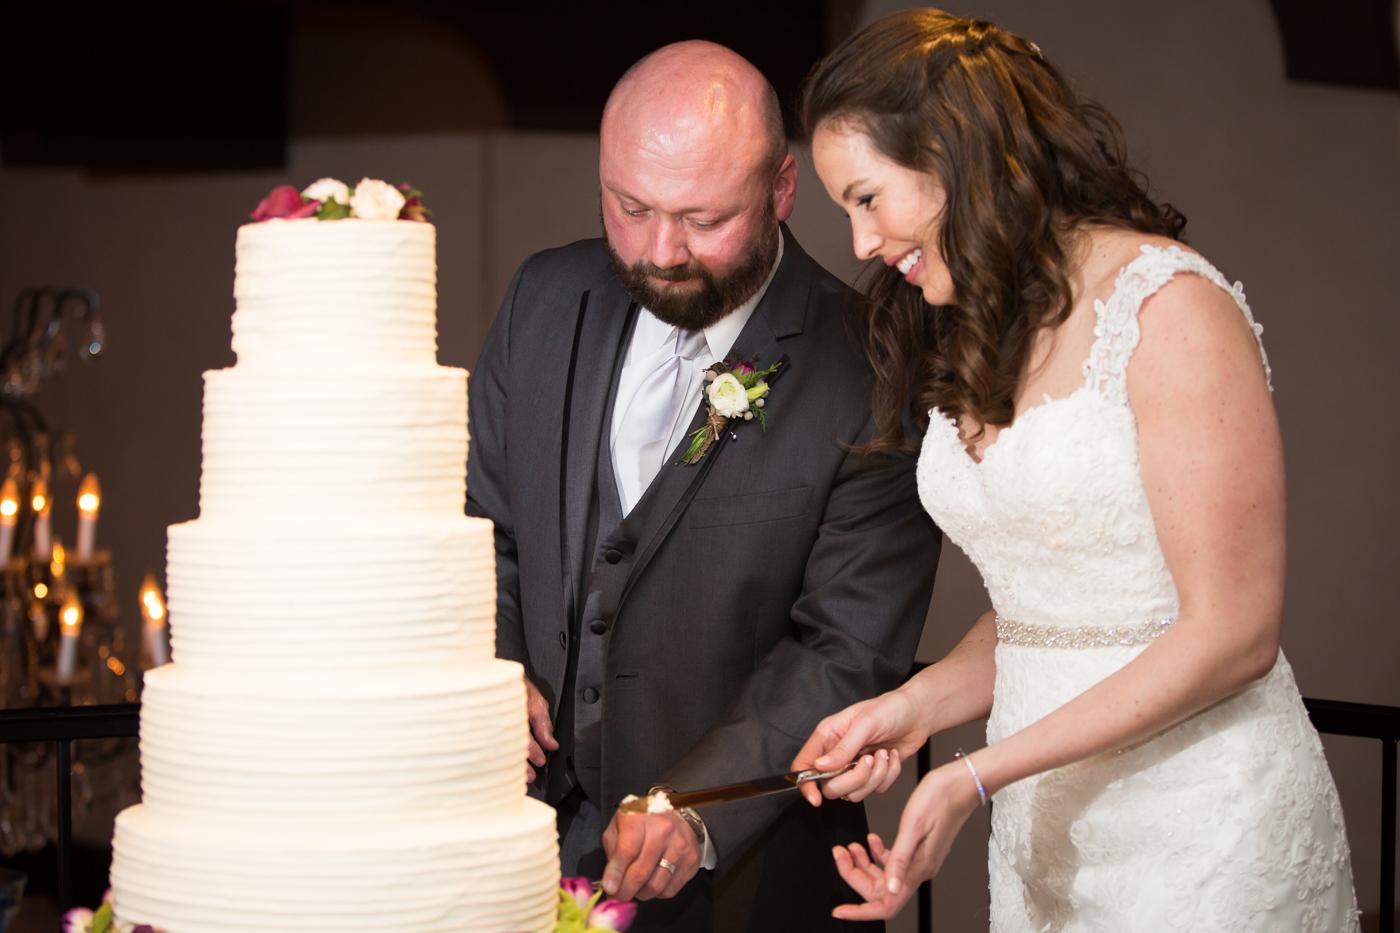 Austin-wedding-photo-and-video-031.jpg